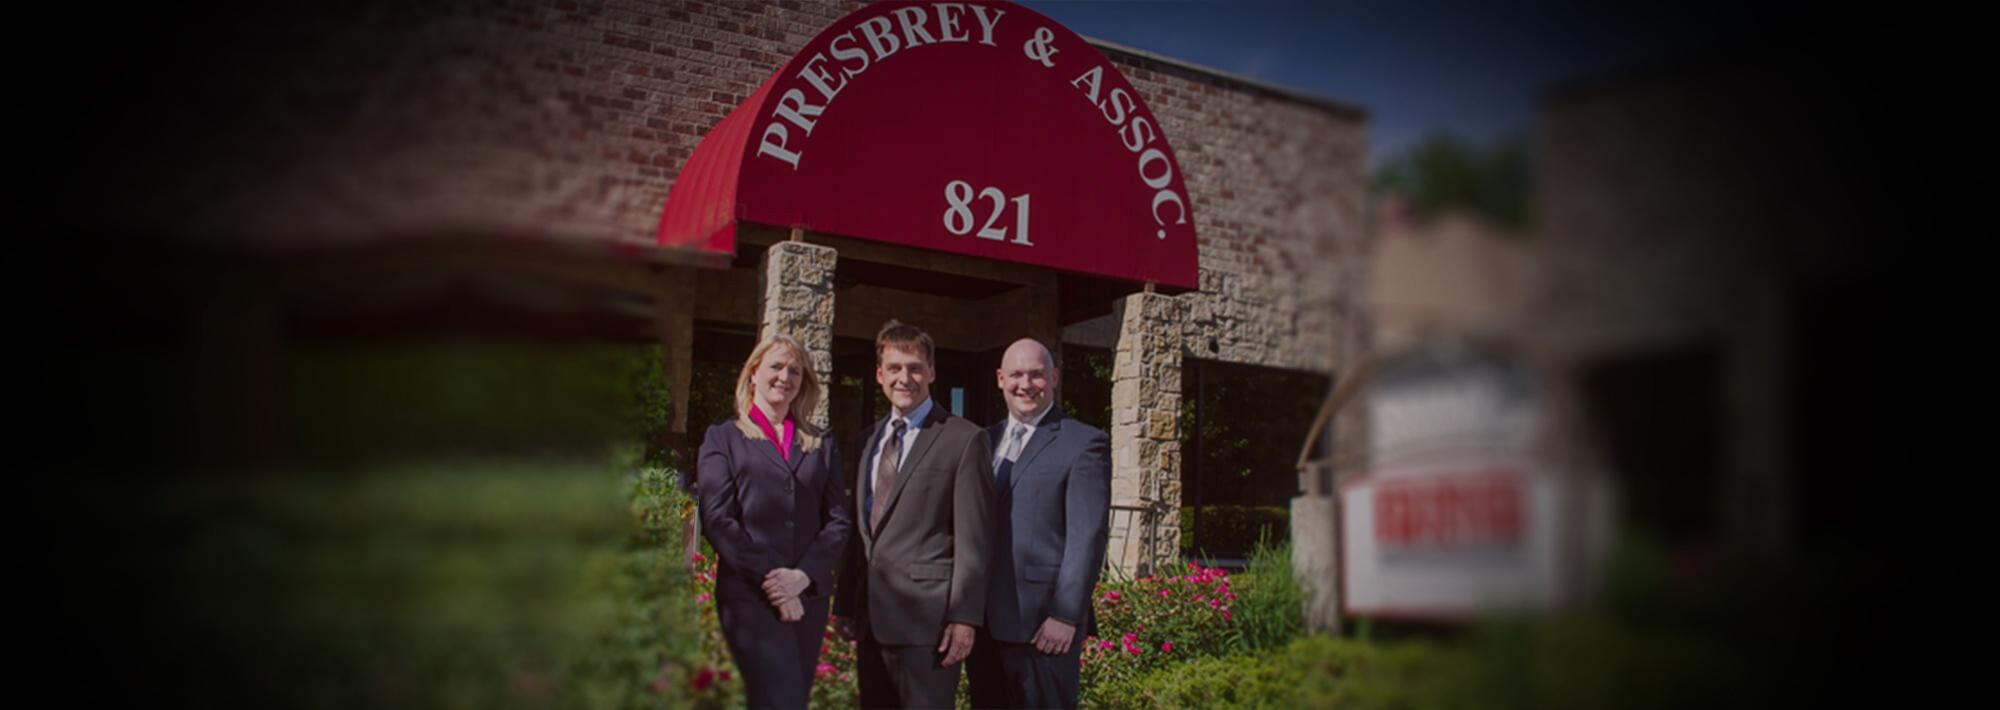 attorneys2.jpg